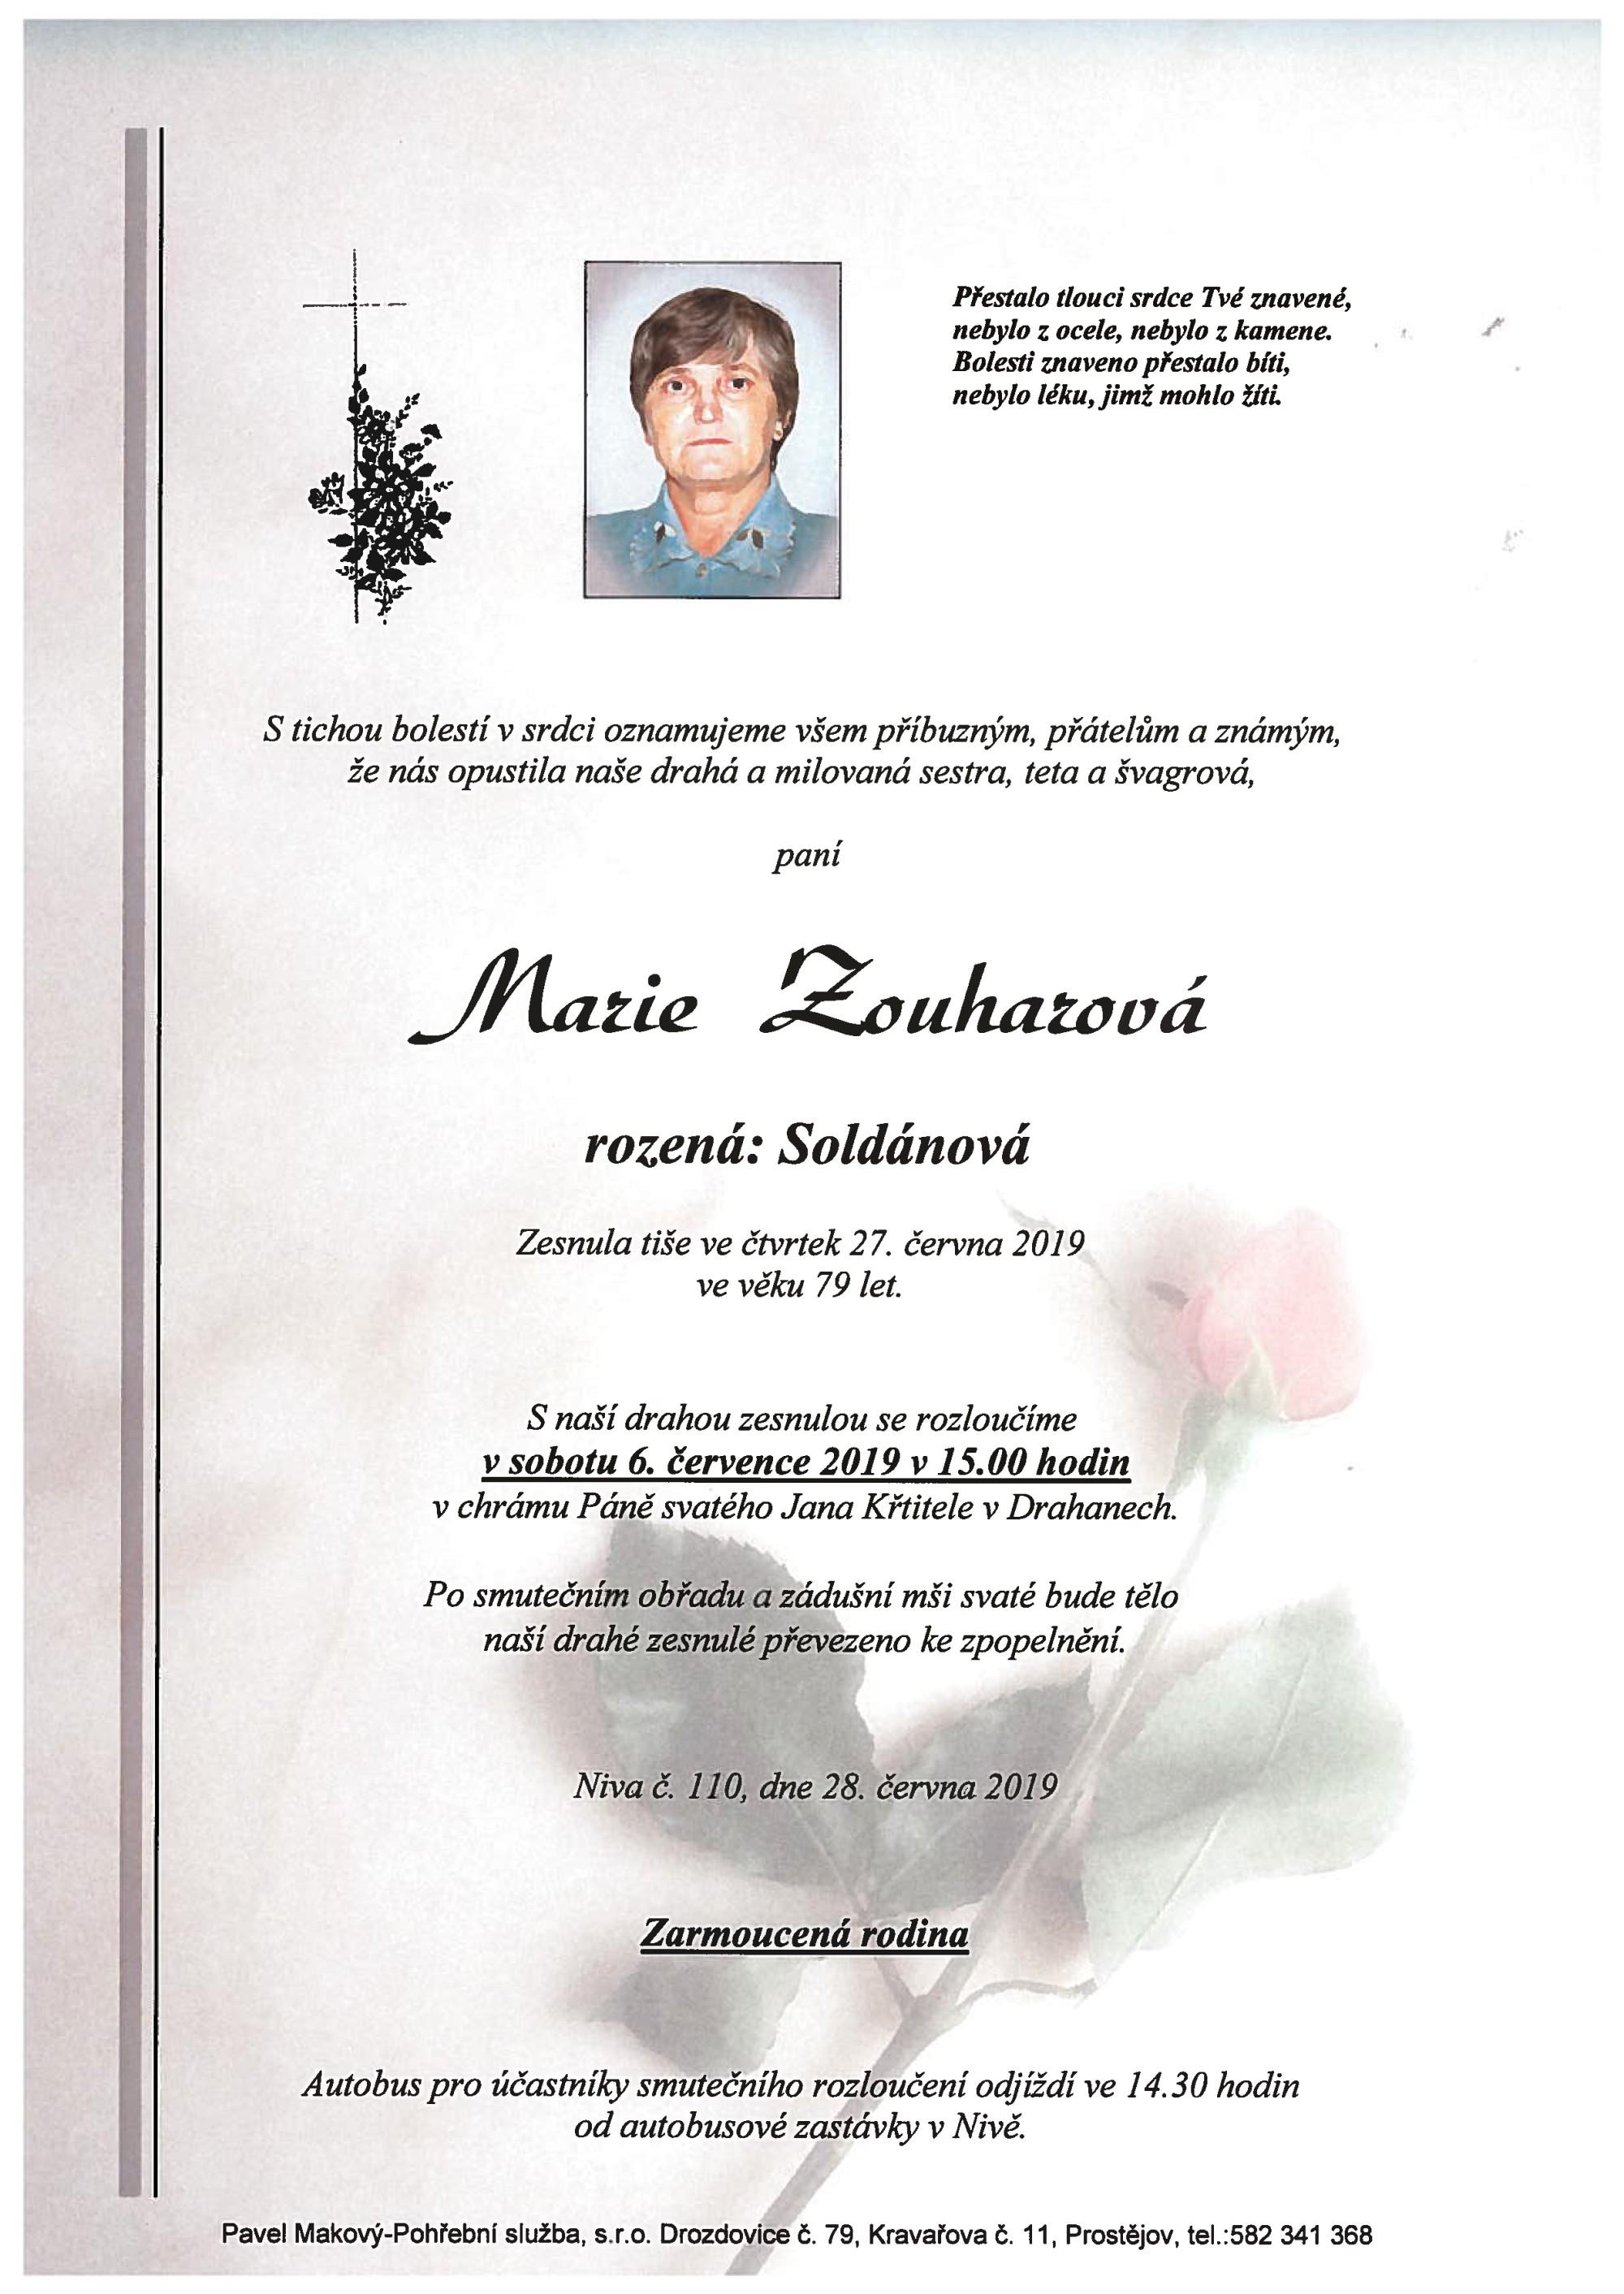 Marie Zouharová